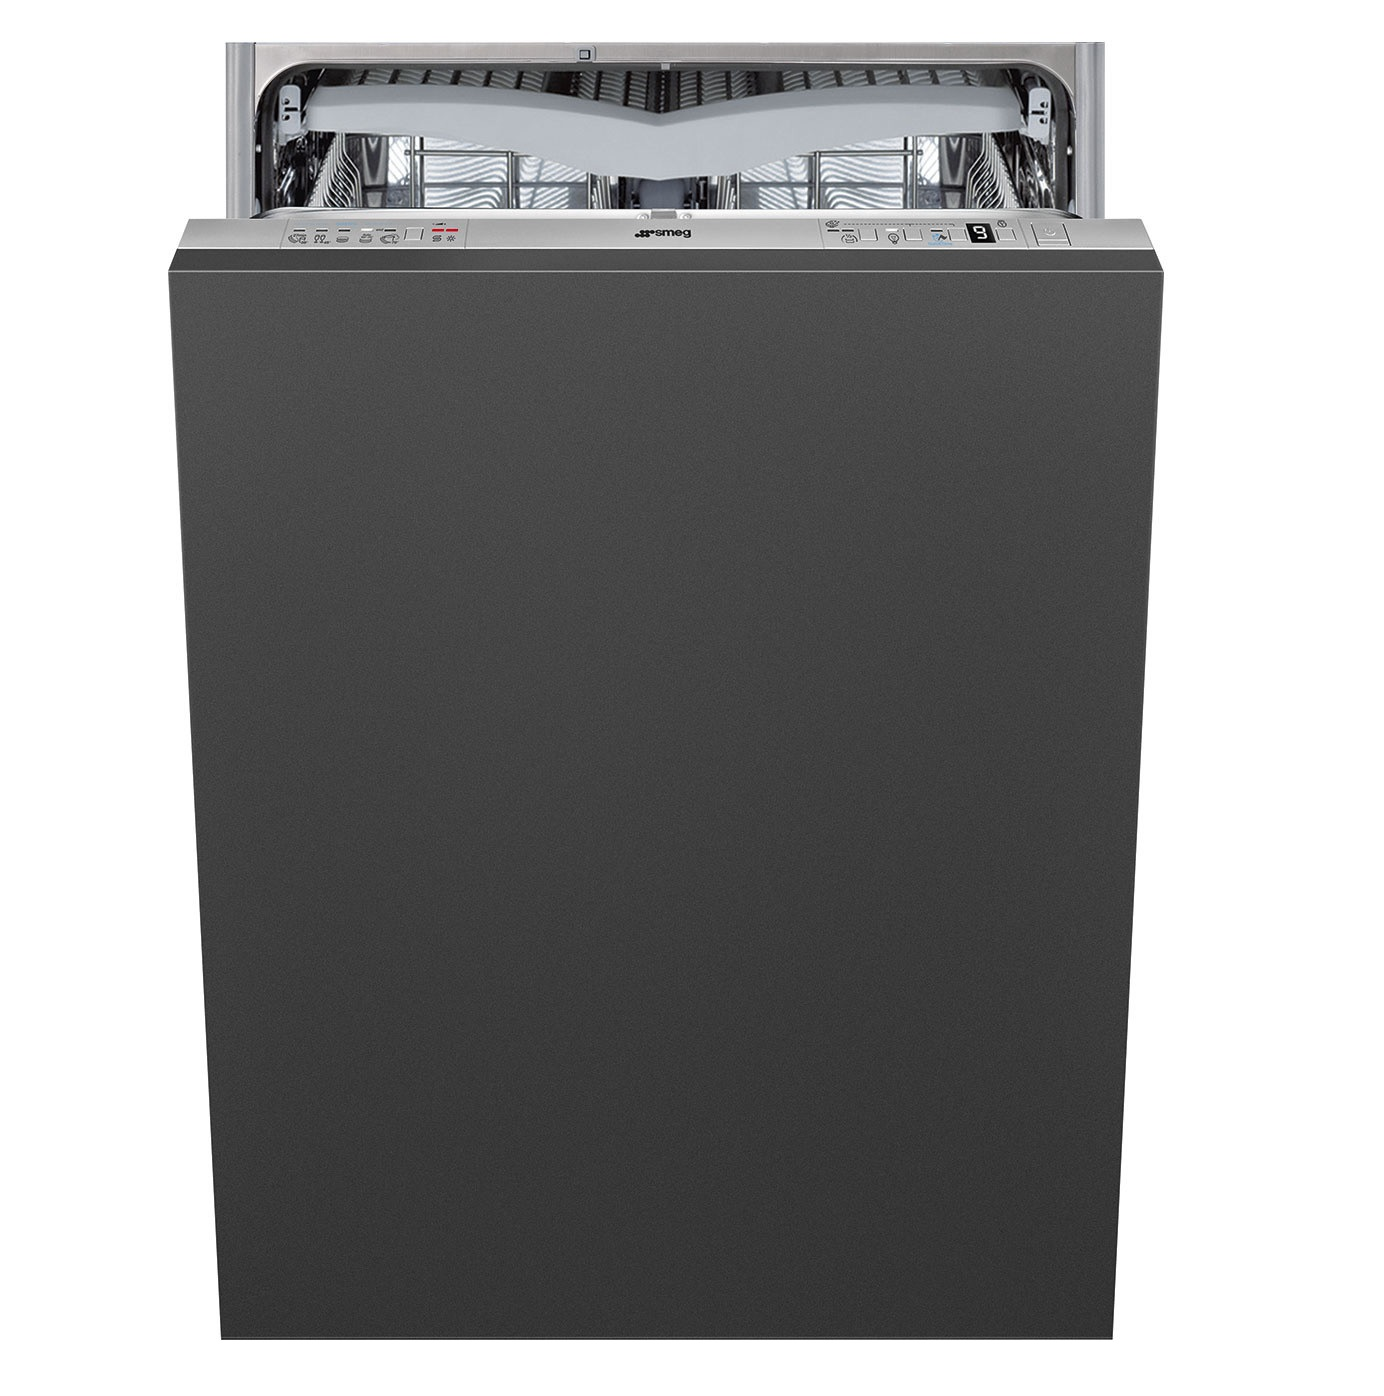 Smeg DWAFI6315T3 Dishwasher